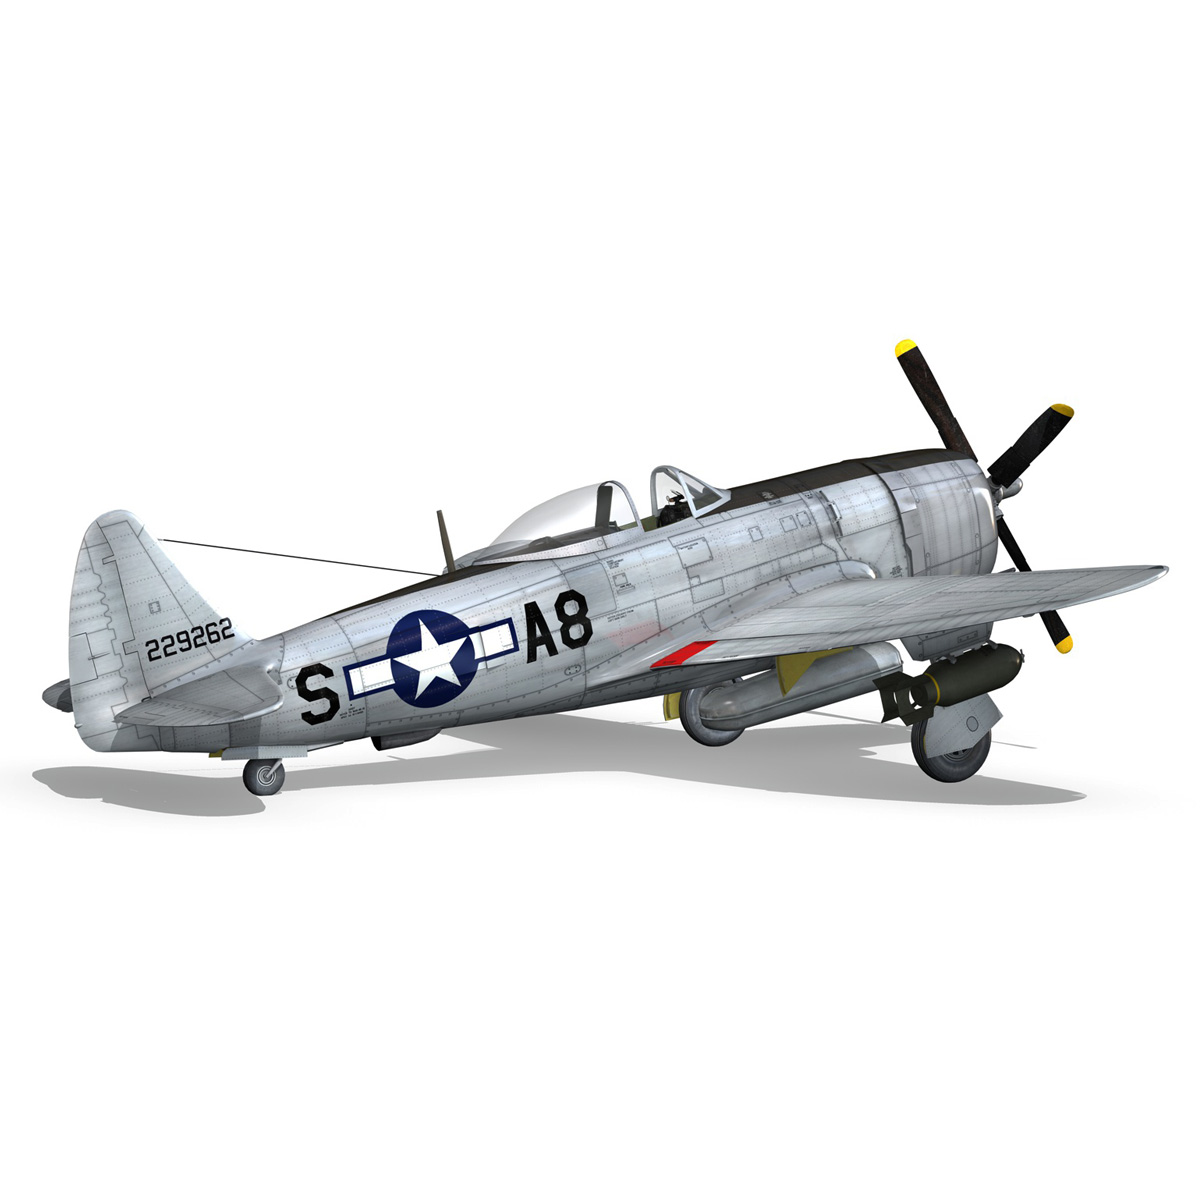 republic p-47 thunderbolt – daddy rabbit 3d model fbx c4d lwo obj 272700